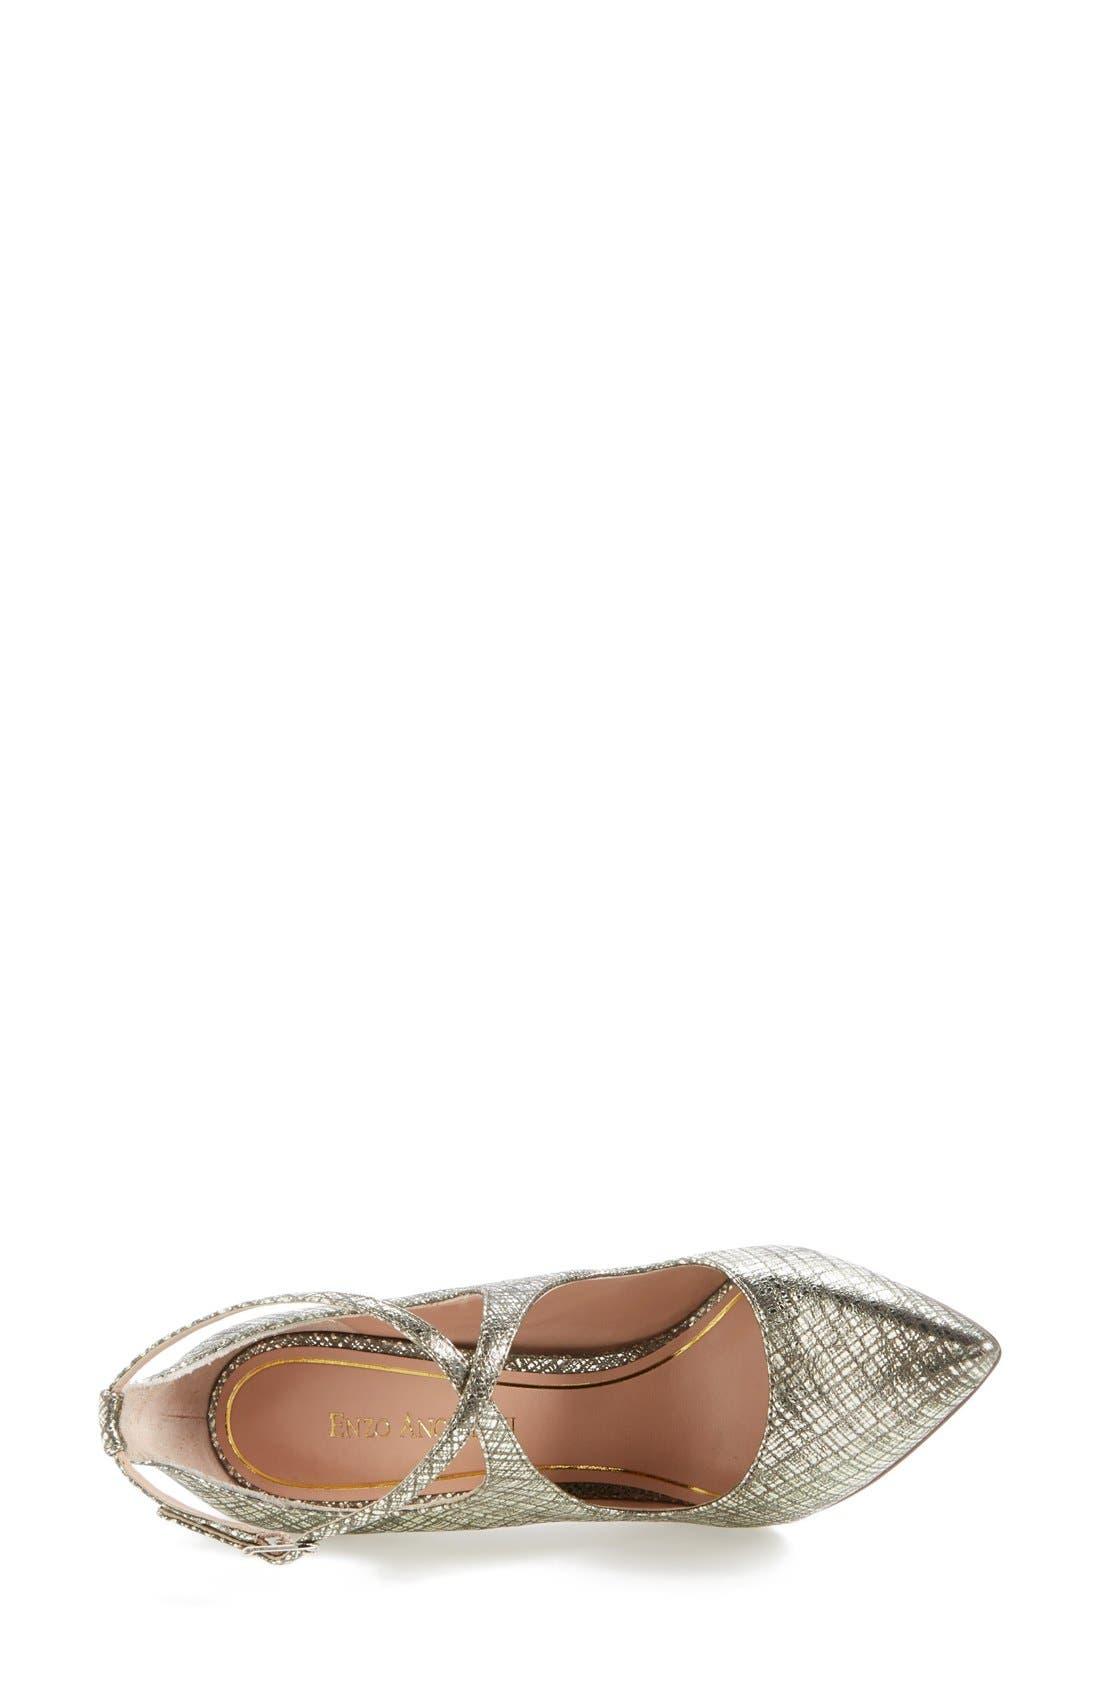 Alternate Image 4  - Enzo Angiolini 'Finton' Leather Pointy Toe Pump (Women)